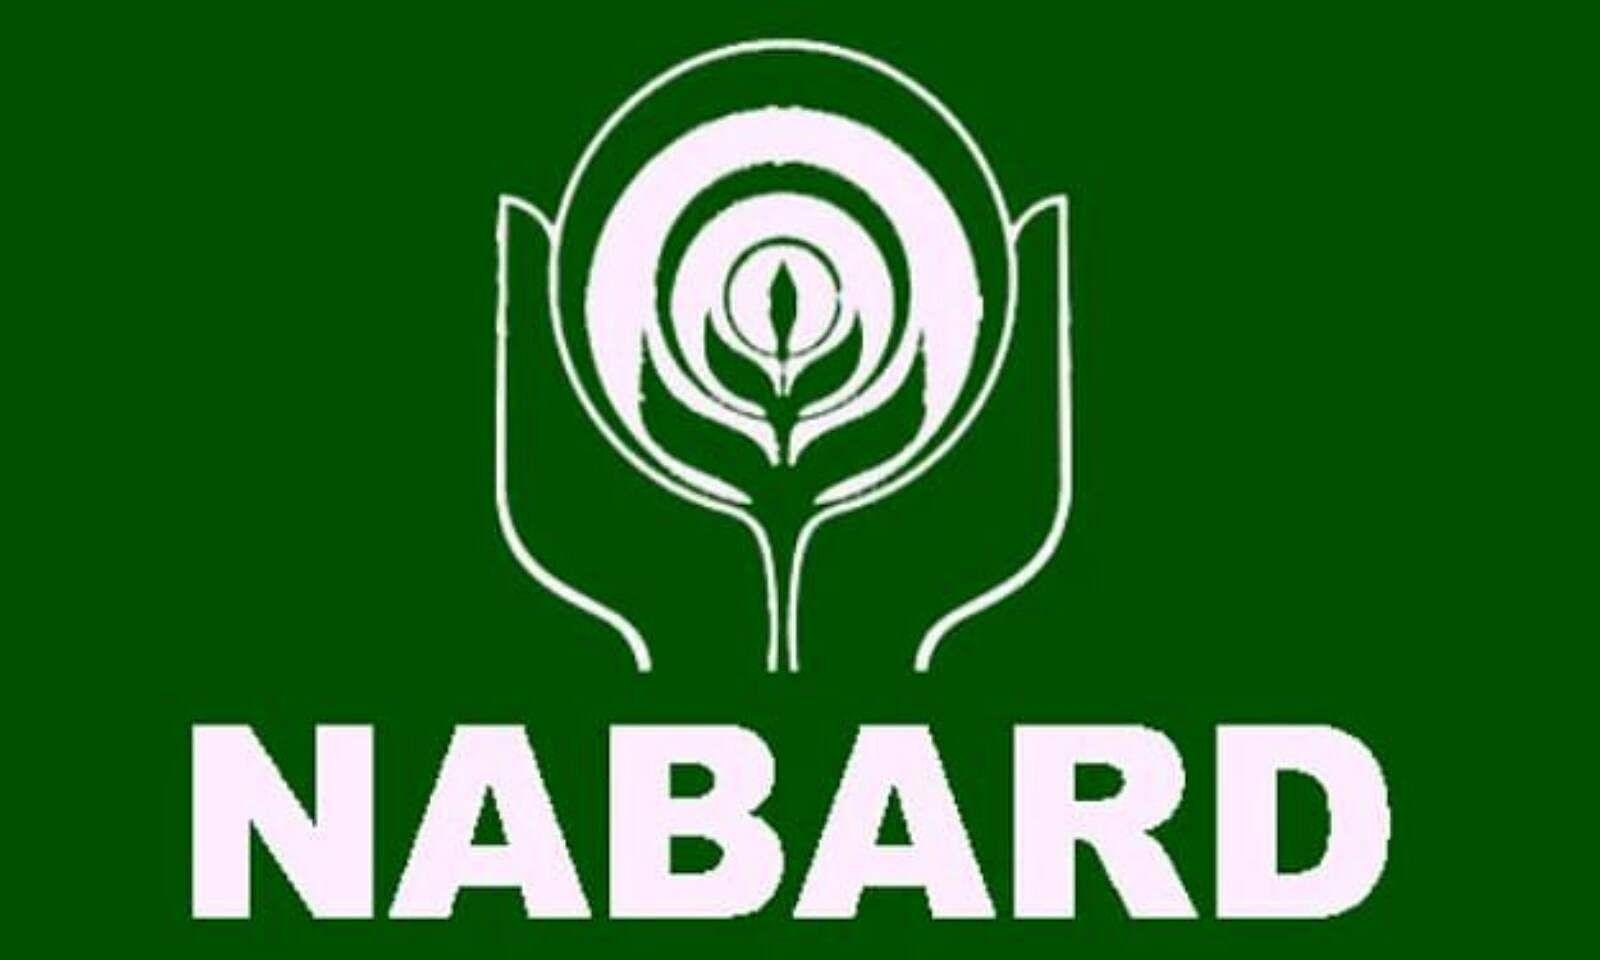 NABARDએ આસિસ્ટન્ટ મેનેજર અને મેનેજરની 162 જગ્યા પર ભરતી જાહેર કરી, 7 ઓગસ્ટ પહેલાં અપ્લાય કરો યુટિલિટી,Utility - Divya Bhaskar